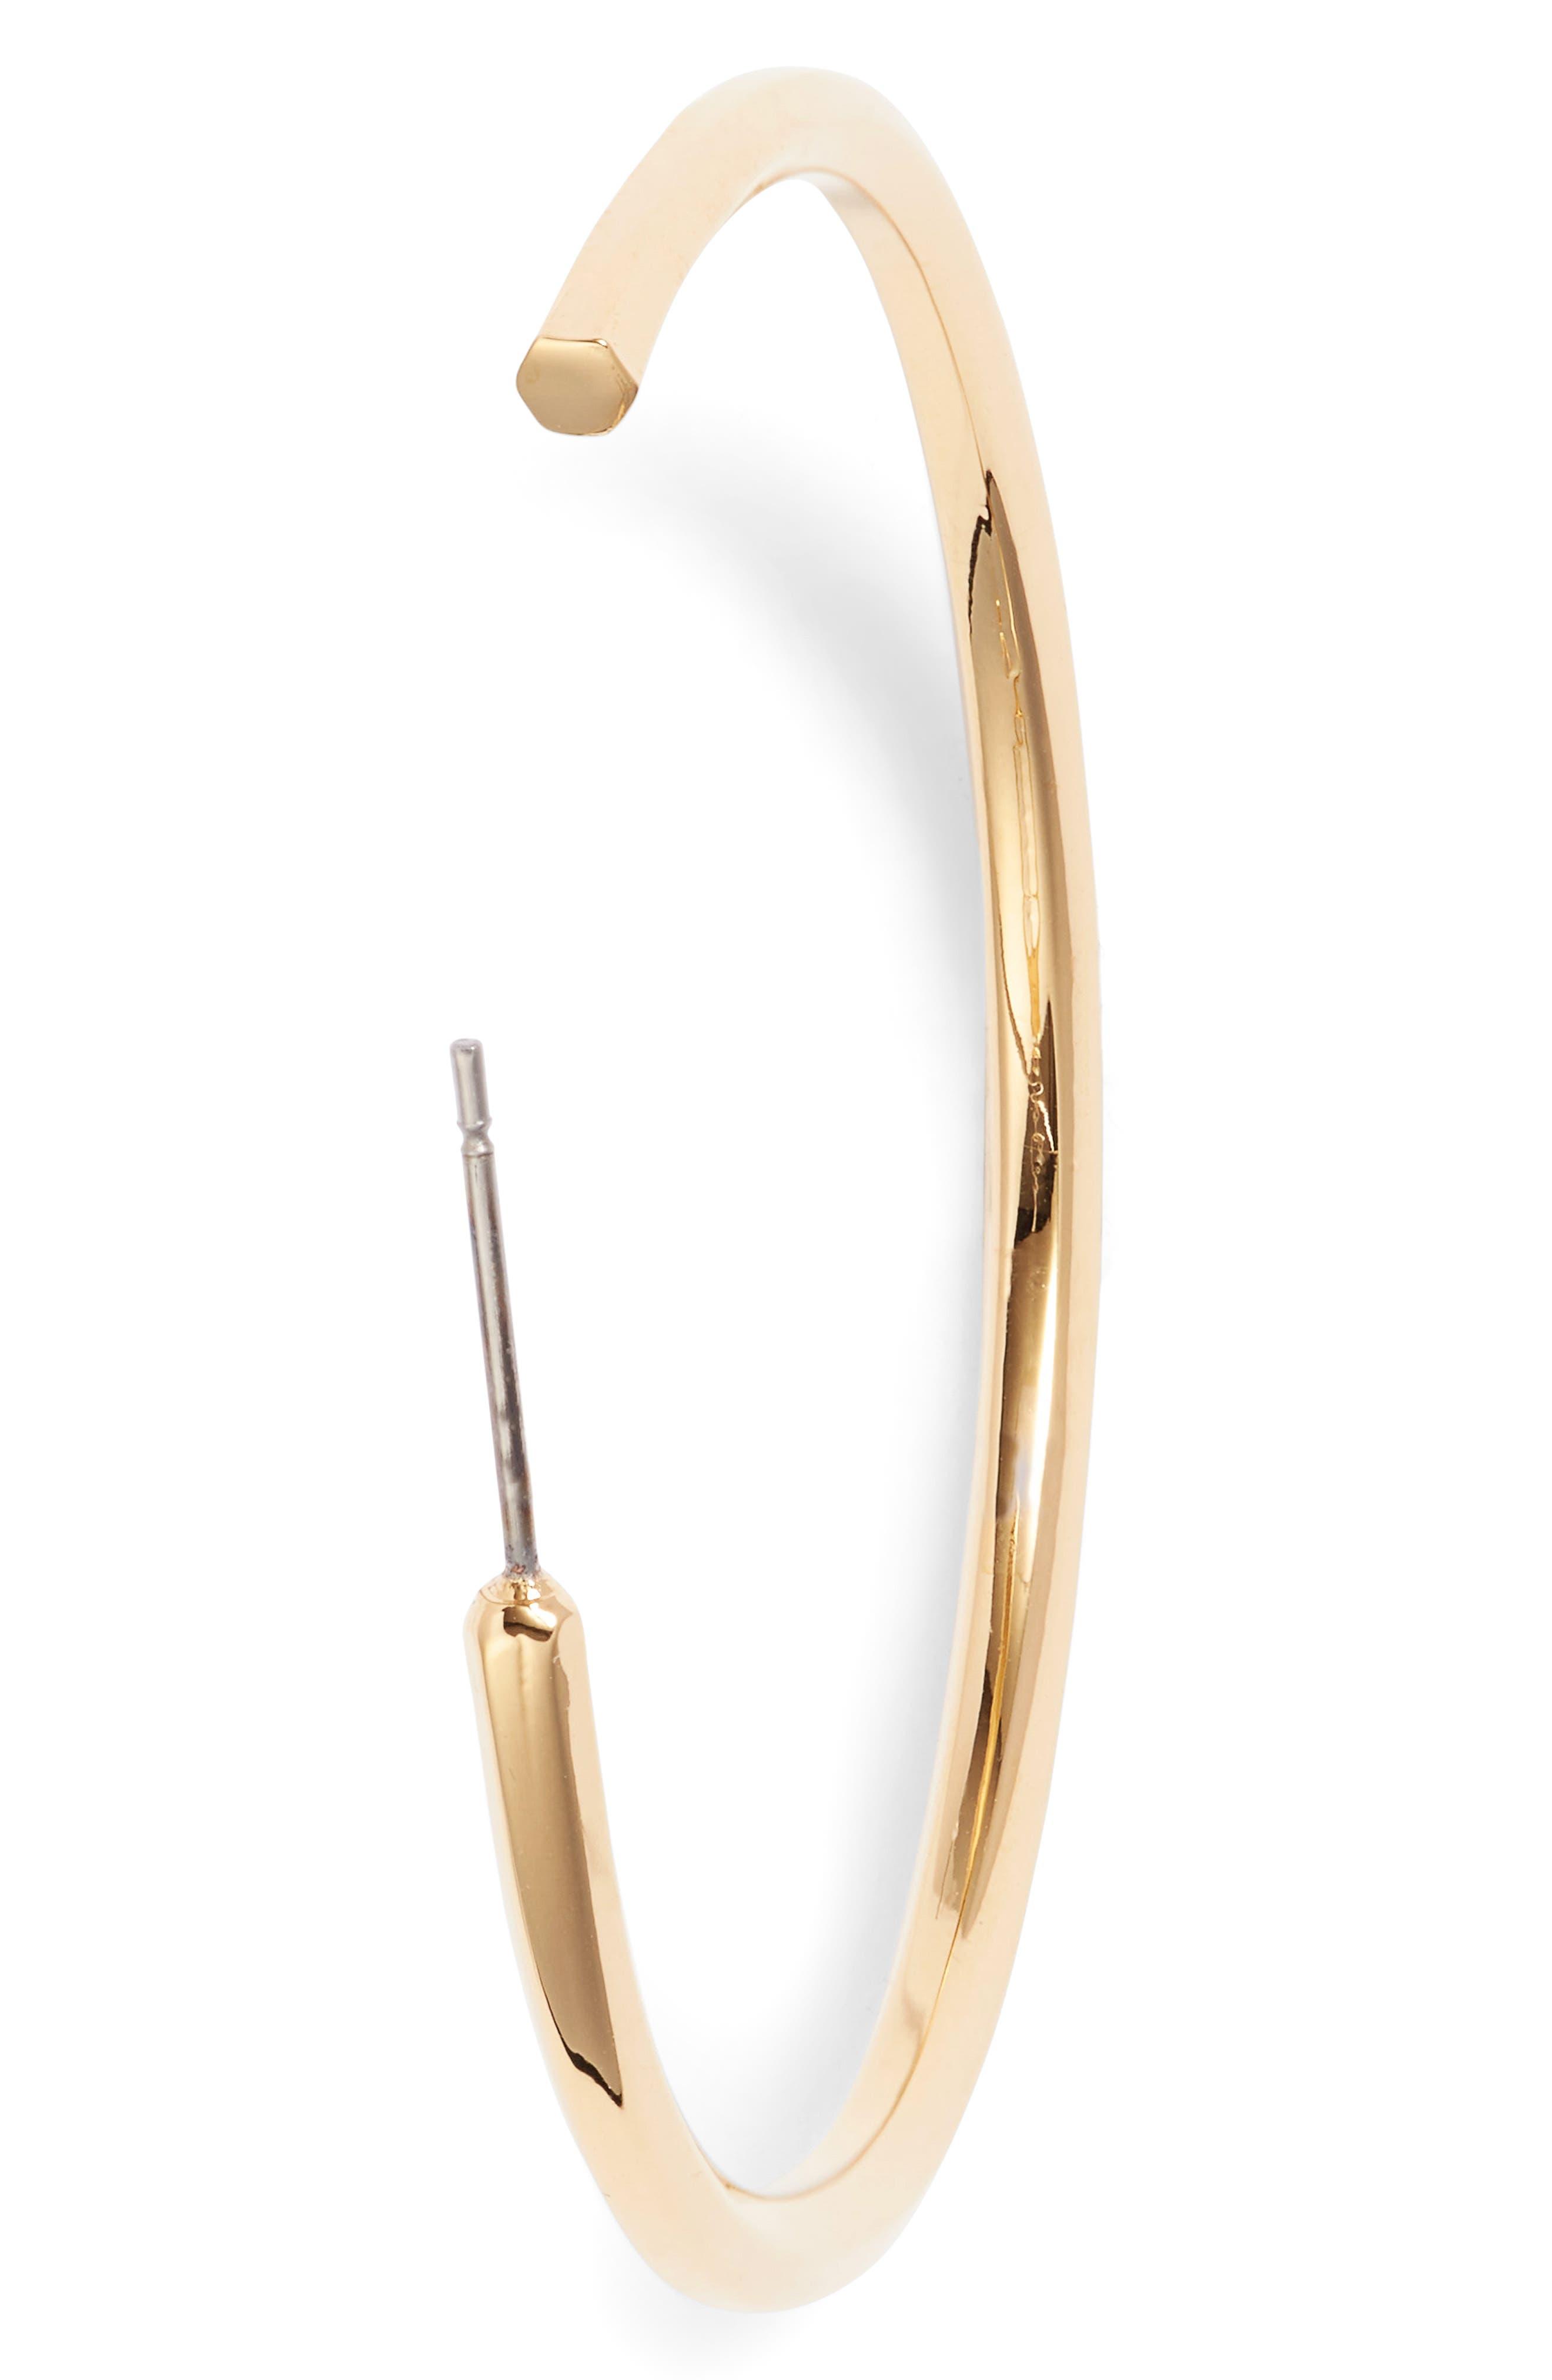 Hexagon Shaped Hoop Earrings,                         Main,                         color, Gold